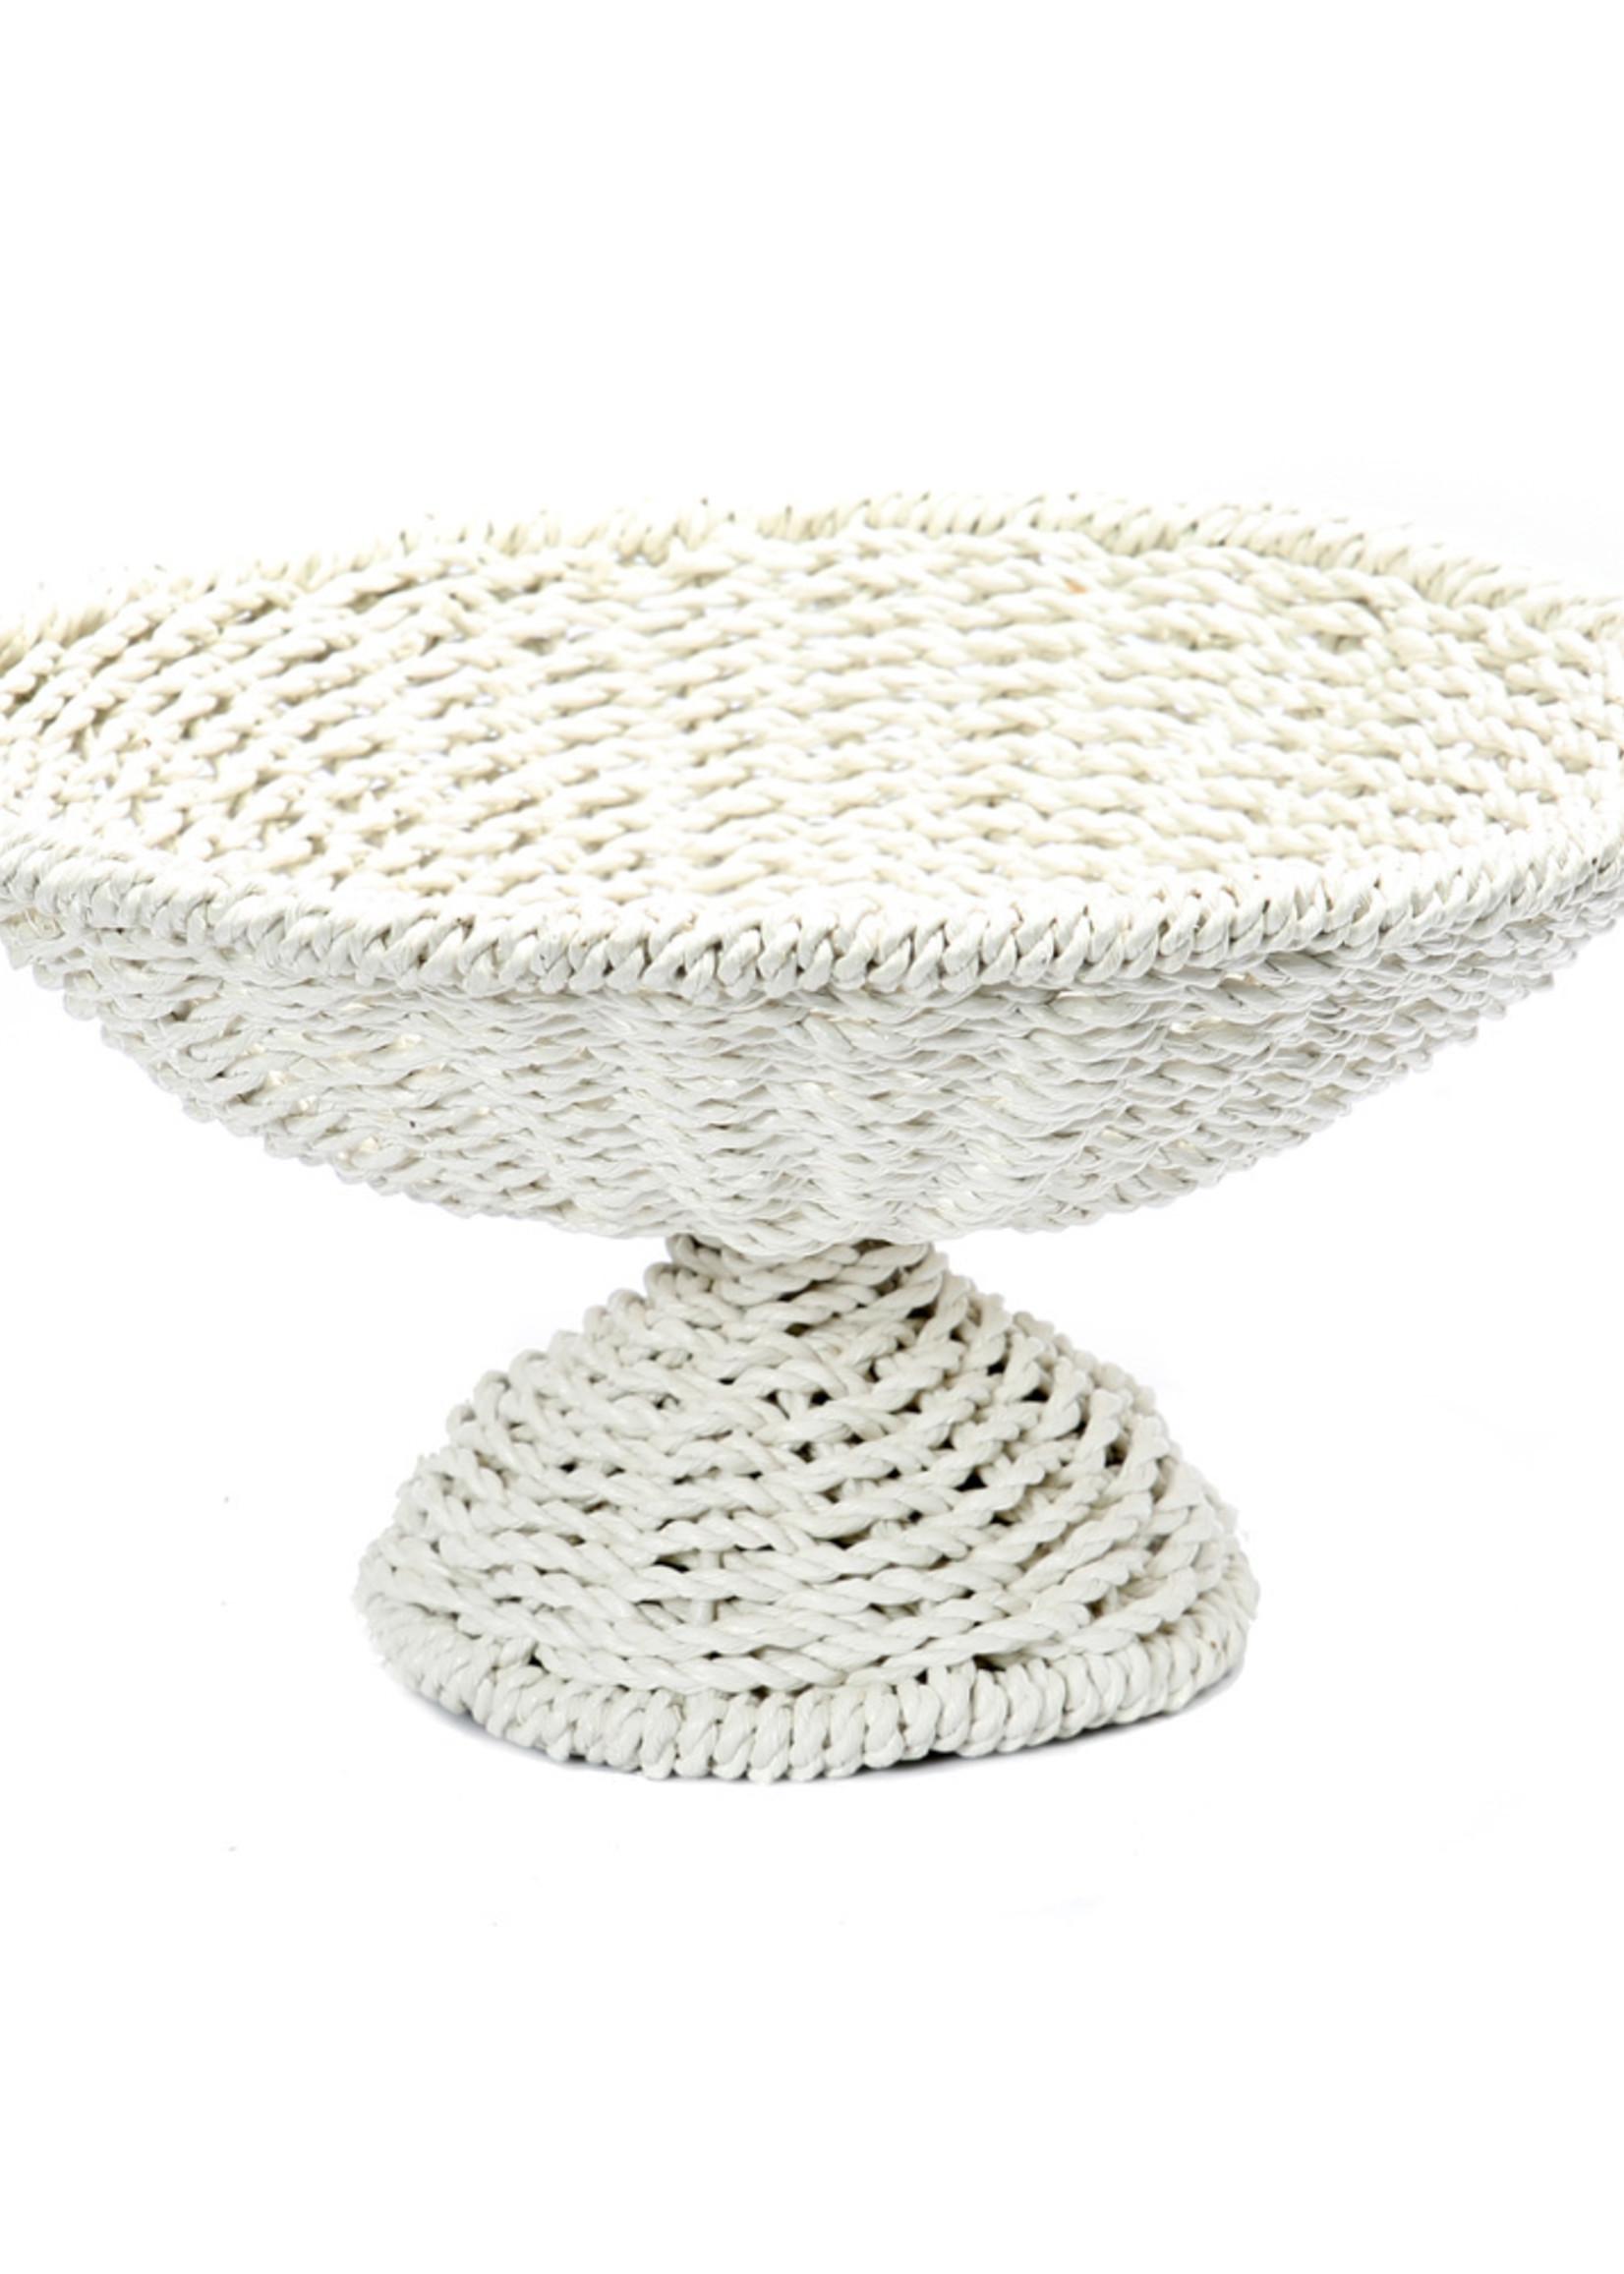 The Seagrass Fruit Platter - White